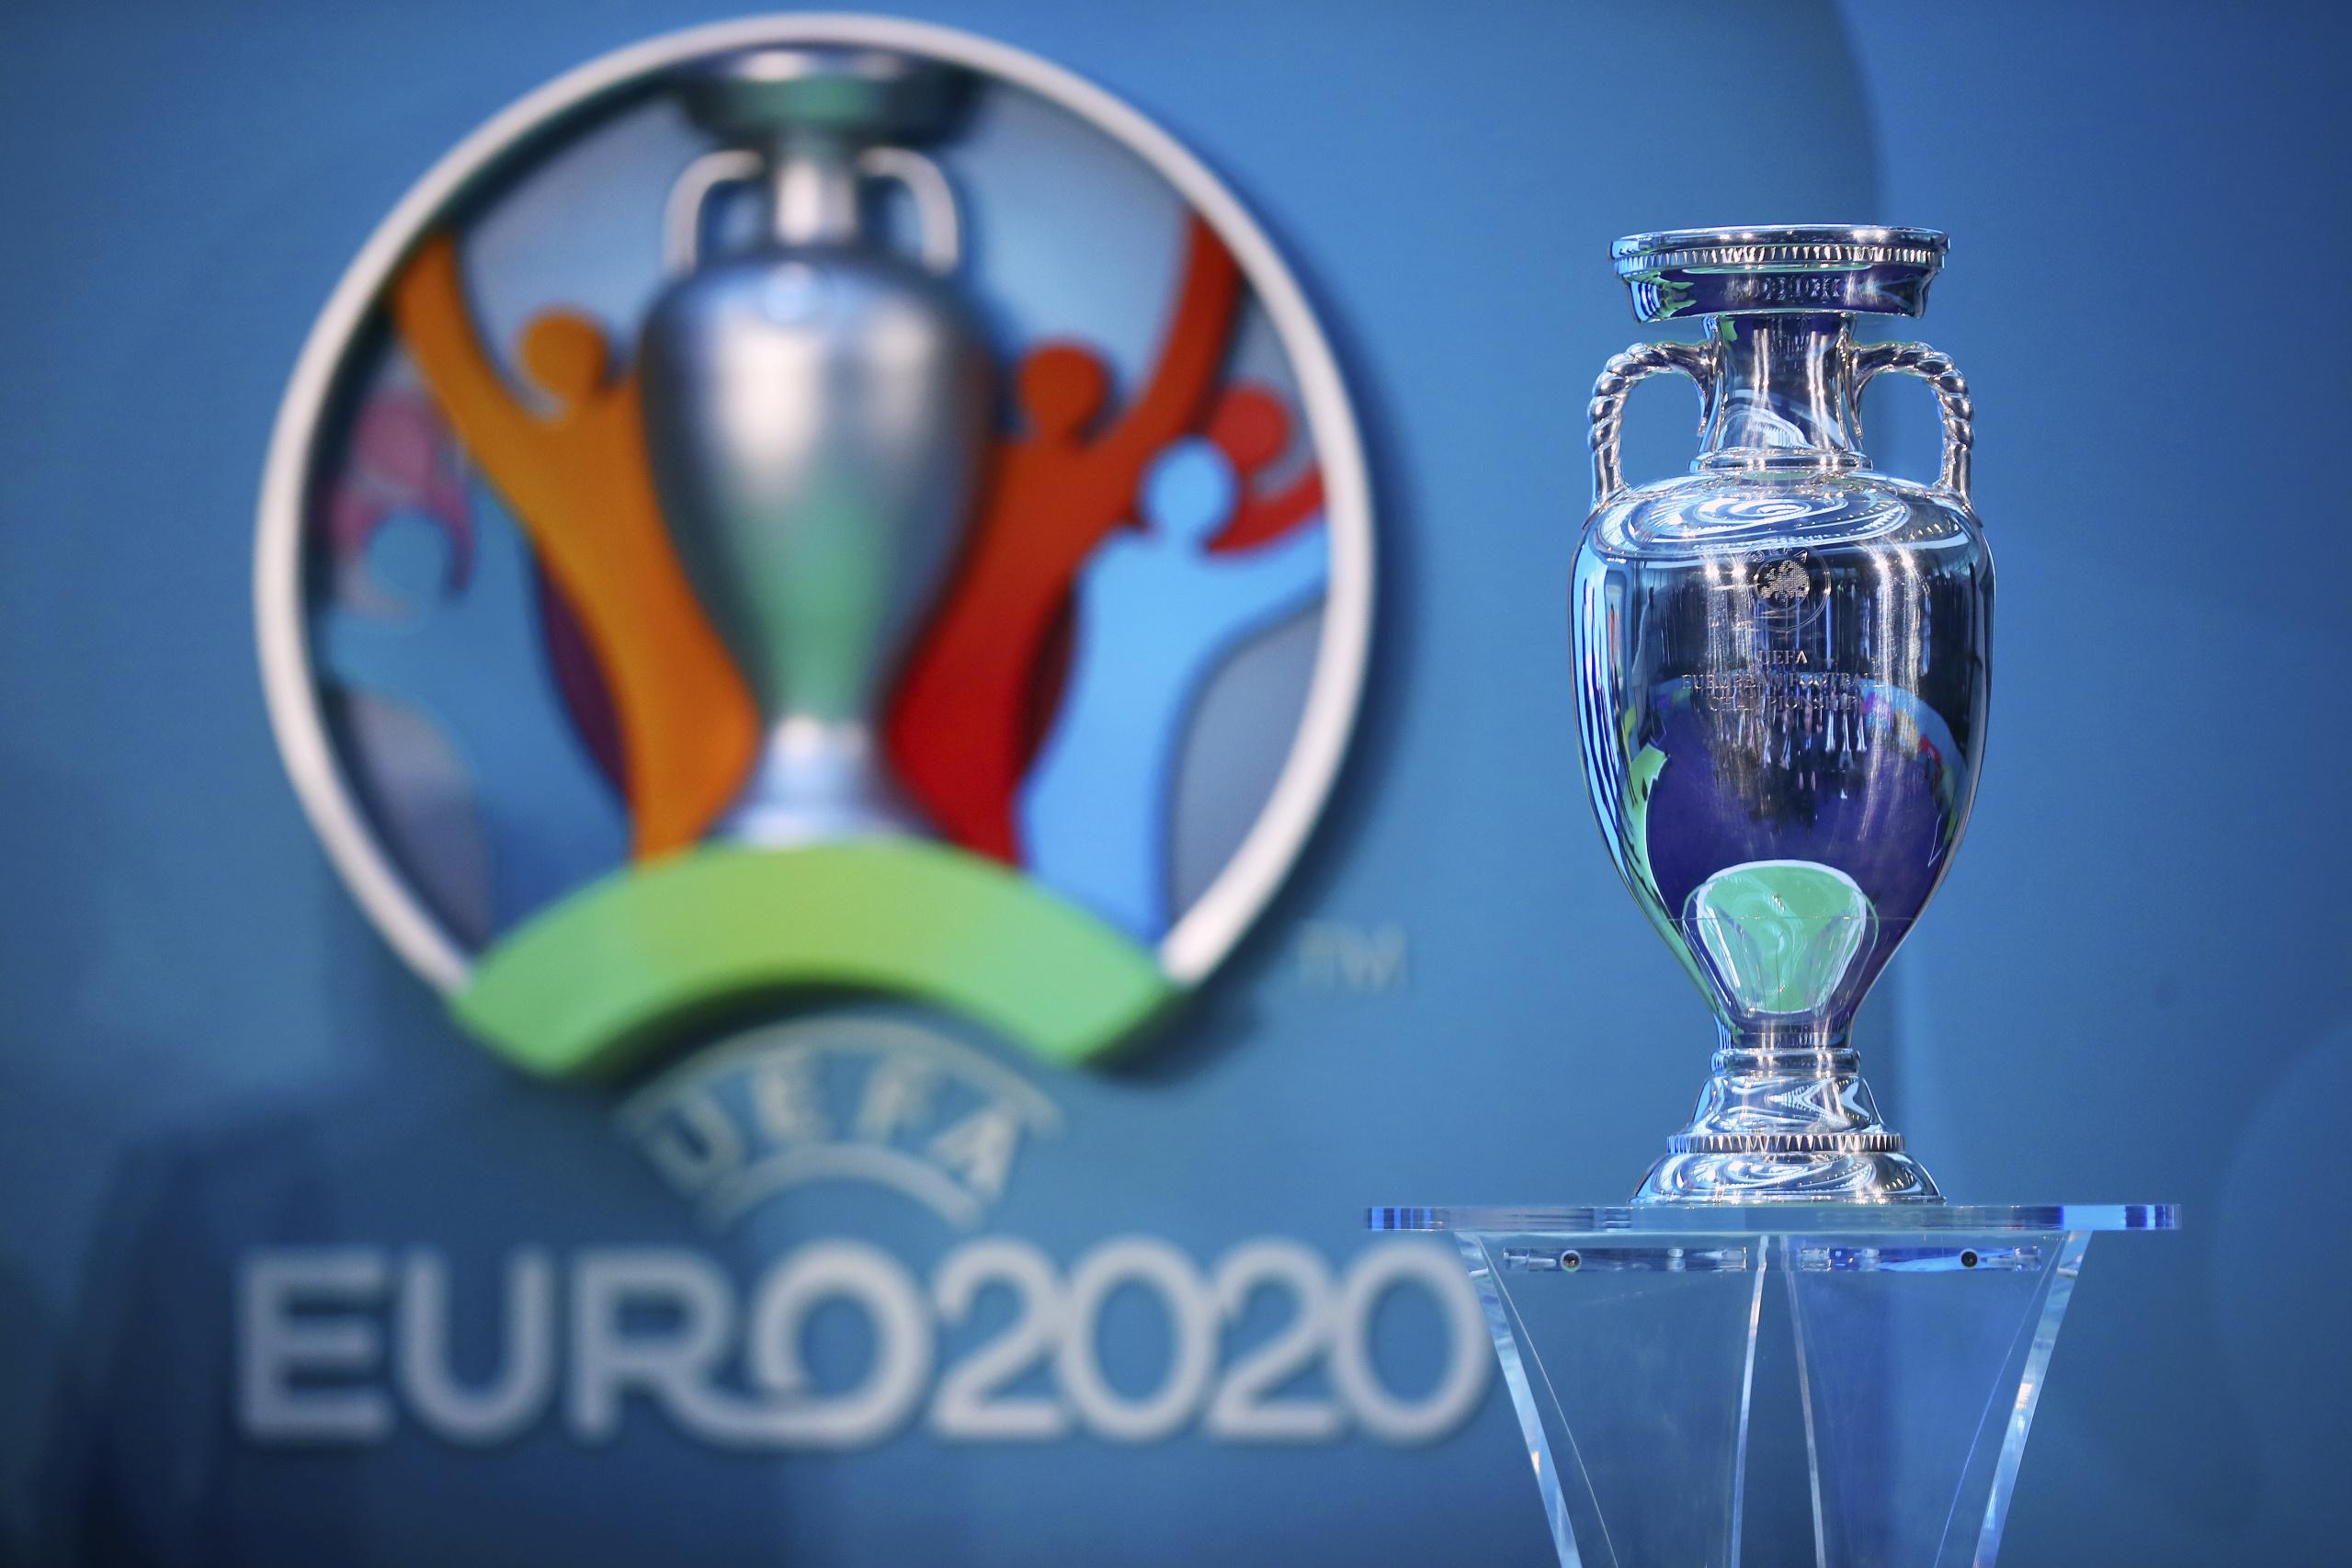 UEFA EURO 2020 ticket prize draw   The Football Association